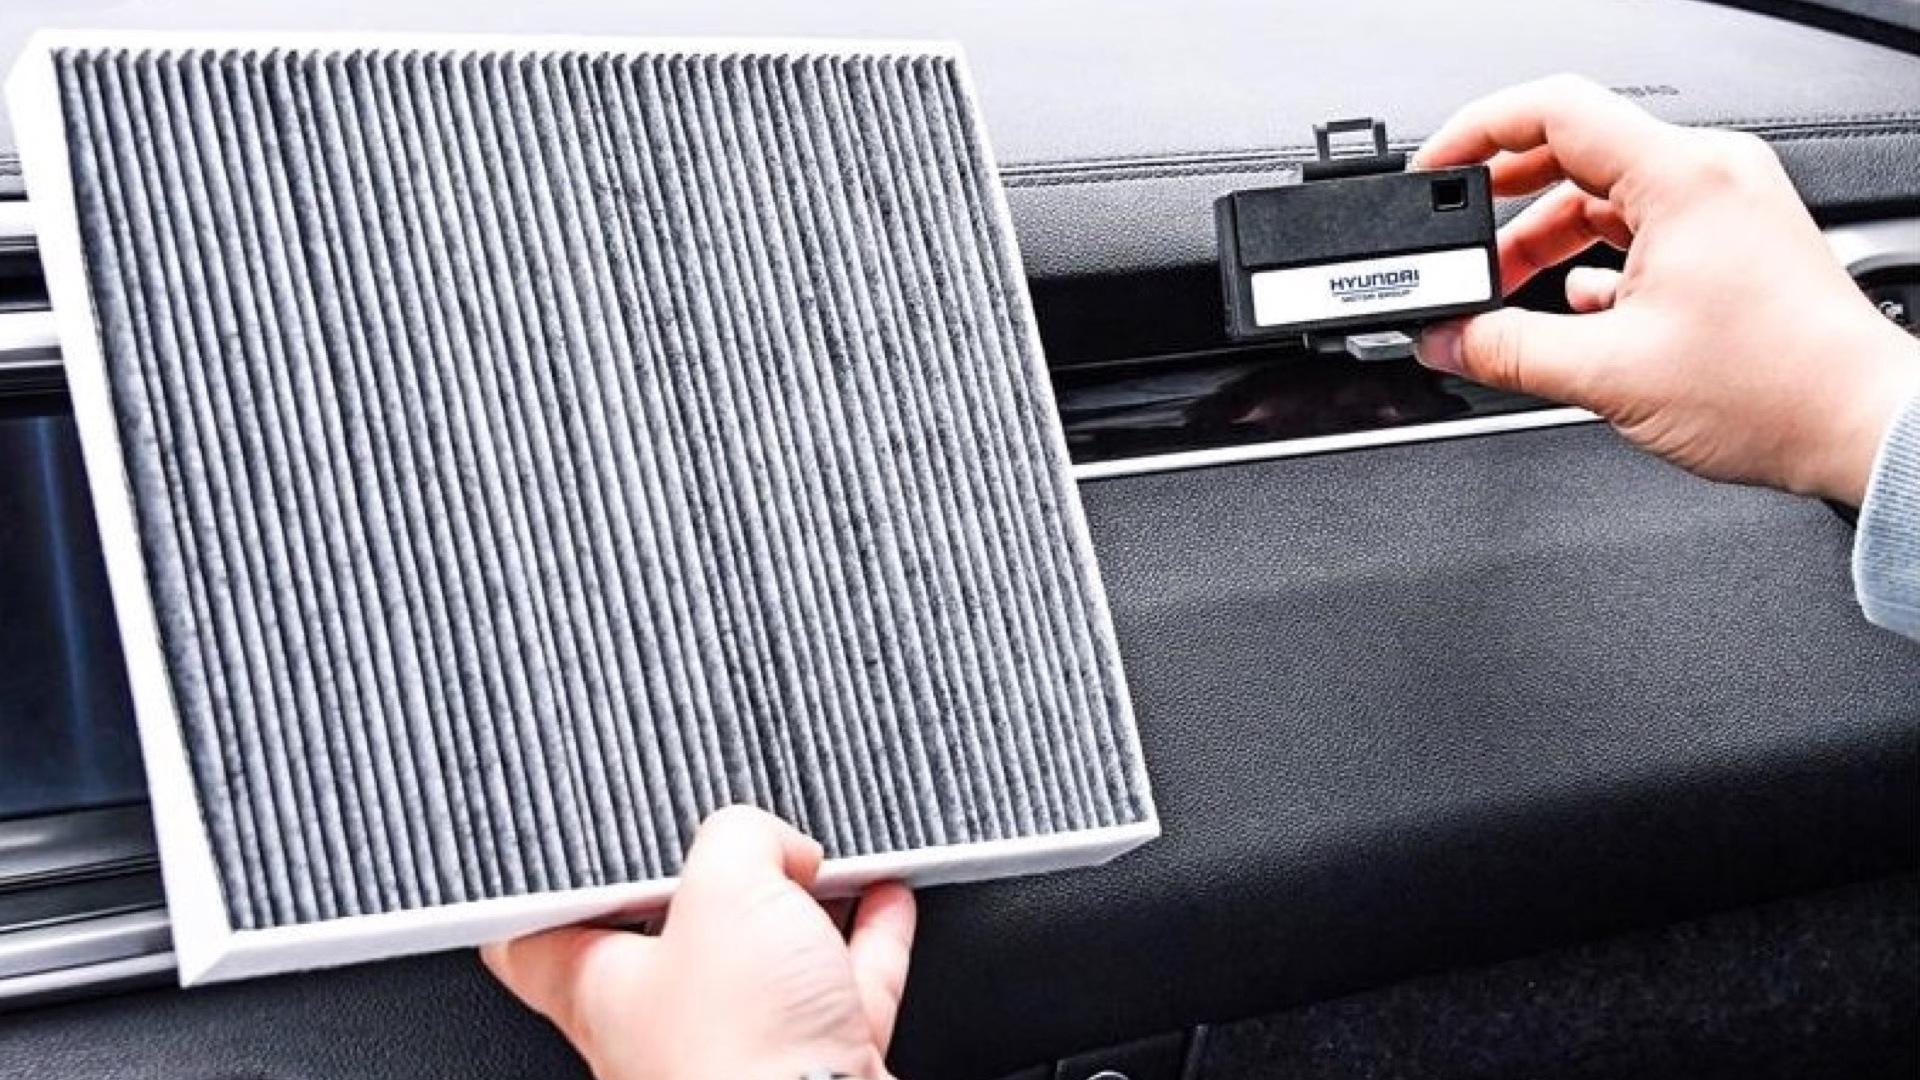 Hyundai Smart Air Purification system